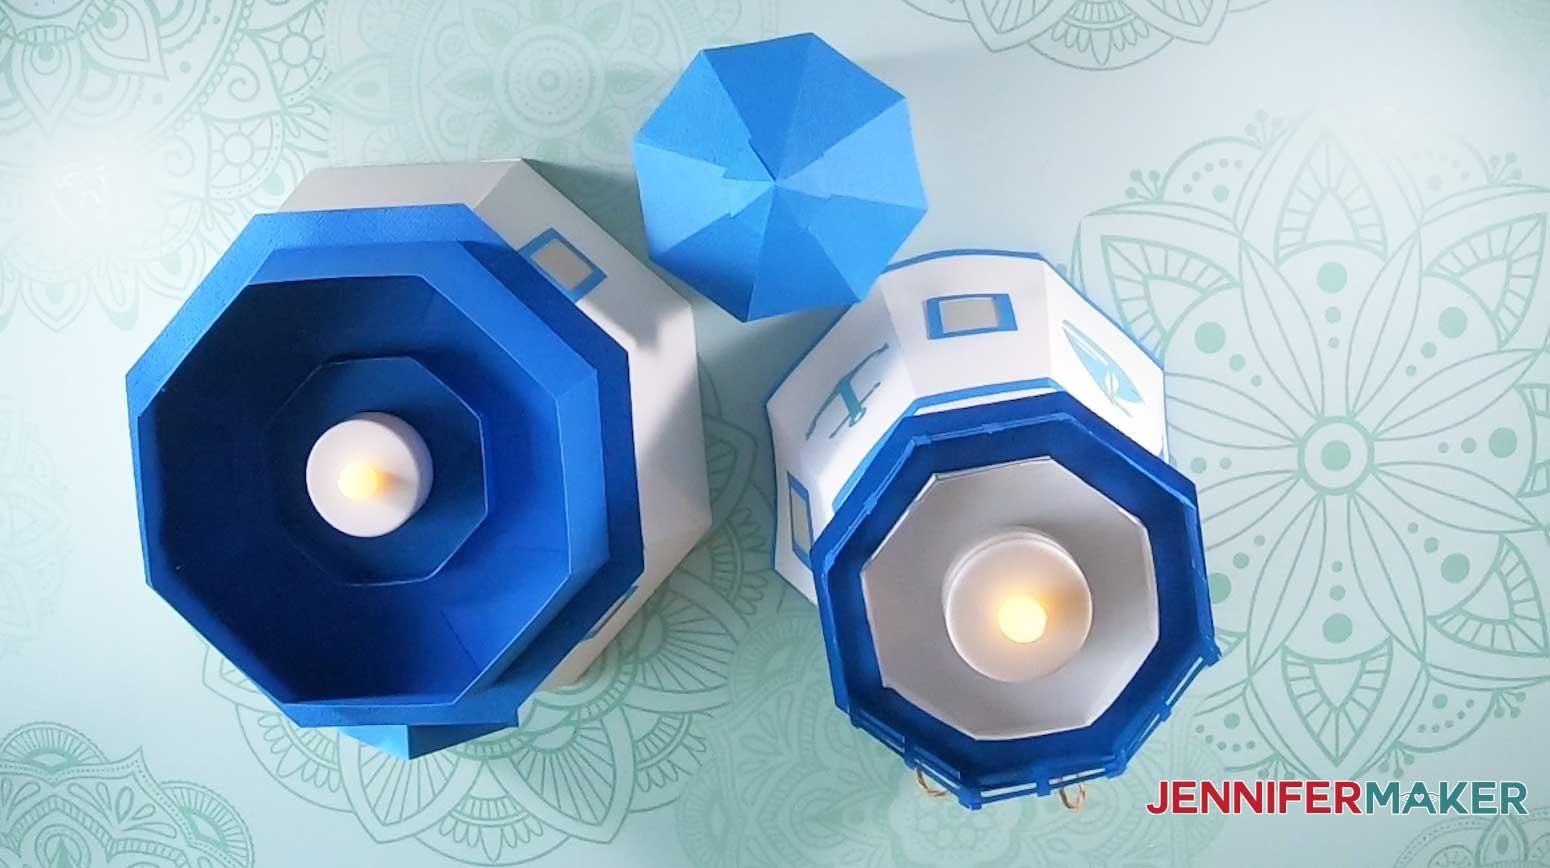 three tiers of jennifermaker paper lighthouse luminary